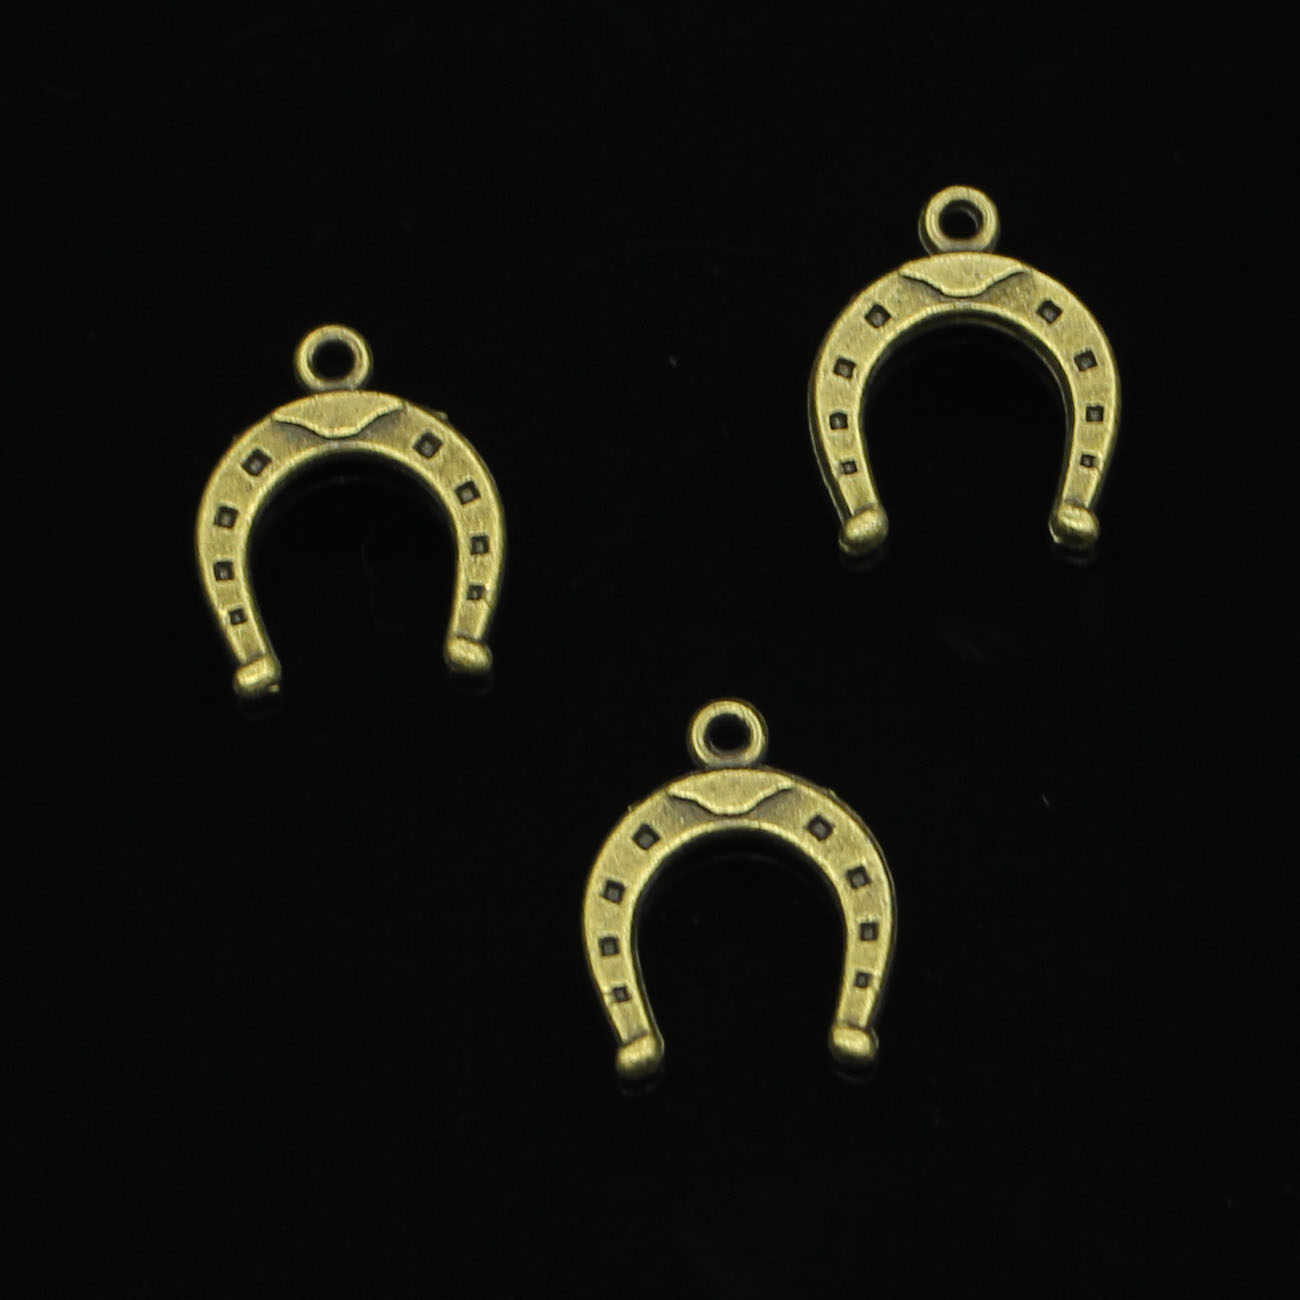 140 pcs עתיק ברונזה מצופה מזל פרסת סוס קסמי עבור תכשיטי ביצוע DIY בעבודת יד תליוני 16*13mm